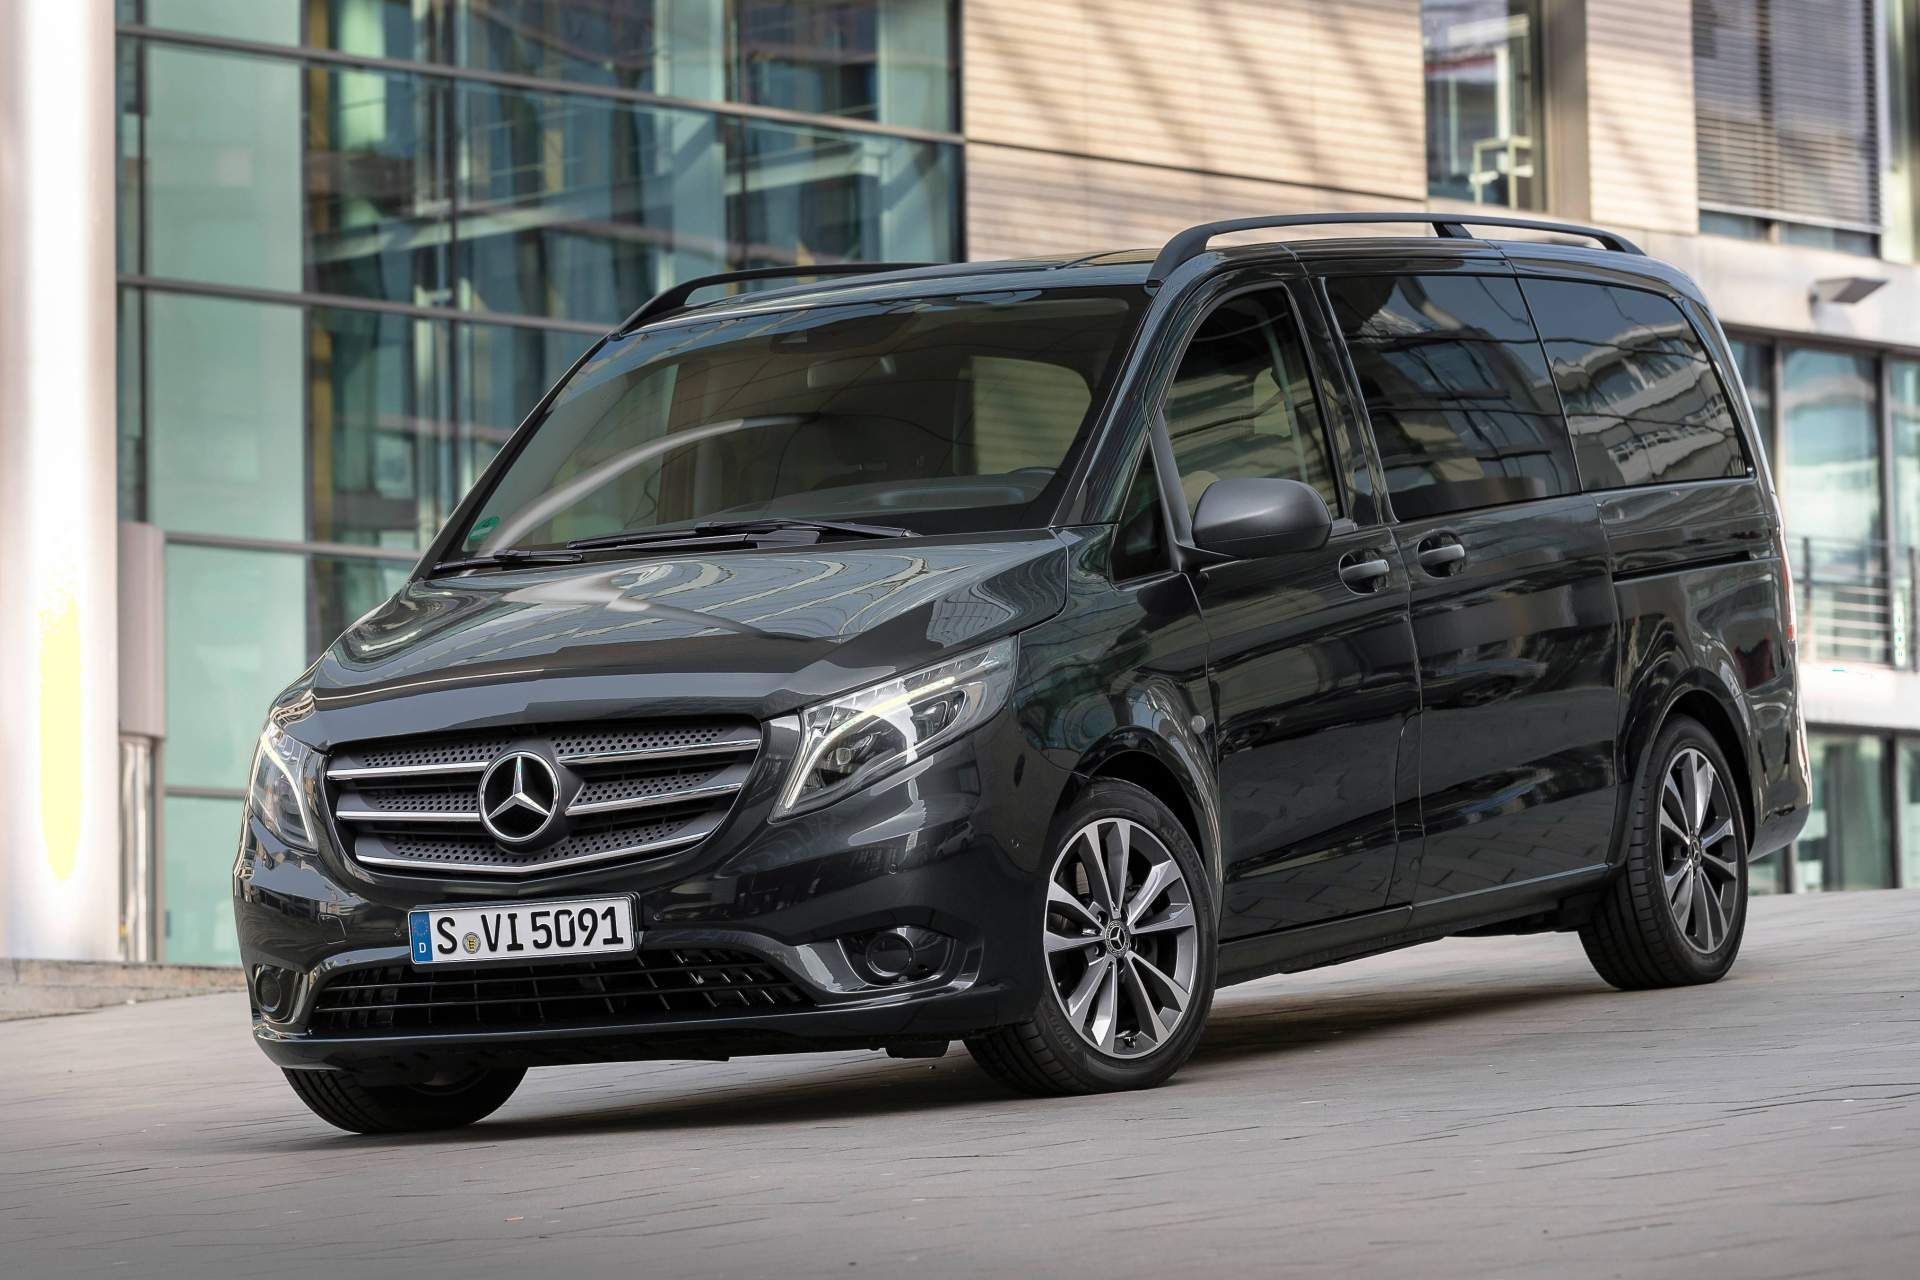 2019 Mercedes Vito Gains Om 654 Diesel From Passenger Car Range 9g Tronic Transmission Carscoops Mercedes Benz Viano Mercedes Benz Vans Benz